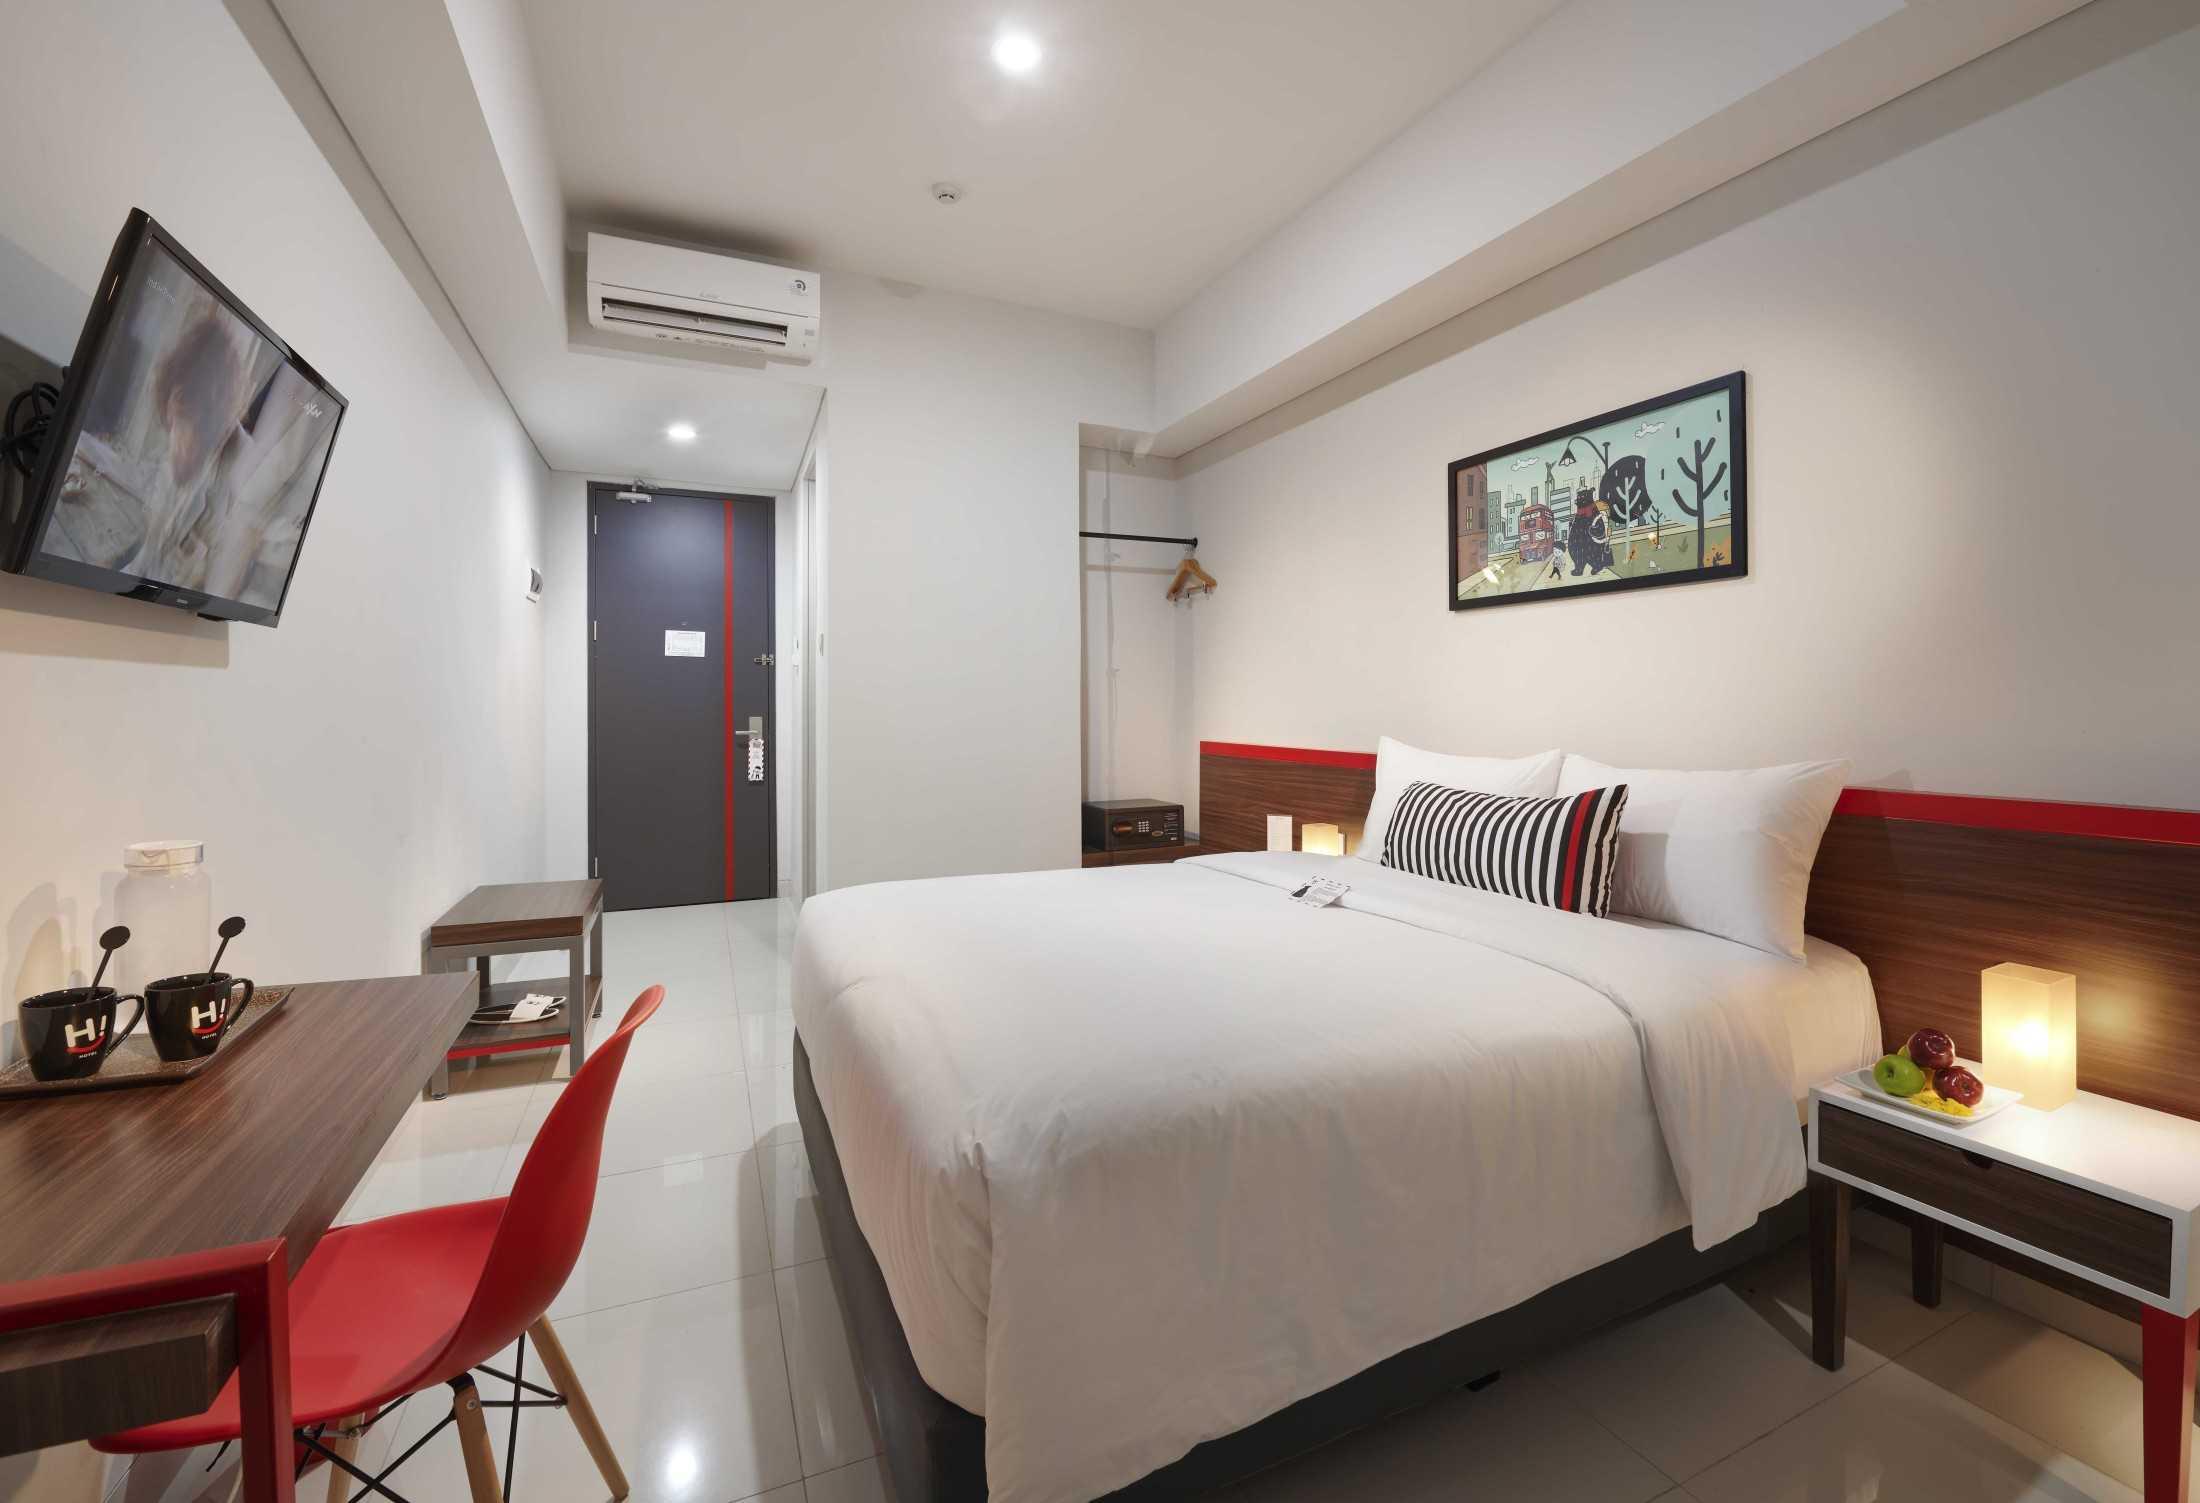 Seed Studio Hi Hotel Jakarta Jakarta Pusat, Kota Jakarta Pusat, Daerah Khusus Ibukota Jakarta, Indonesia Jakarta Pusat, Kota Jakarta Pusat, Daerah Khusus Ibukota Jakarta, Indonesia Seed-Studio-Hi-Hotel-Jakarta  115811